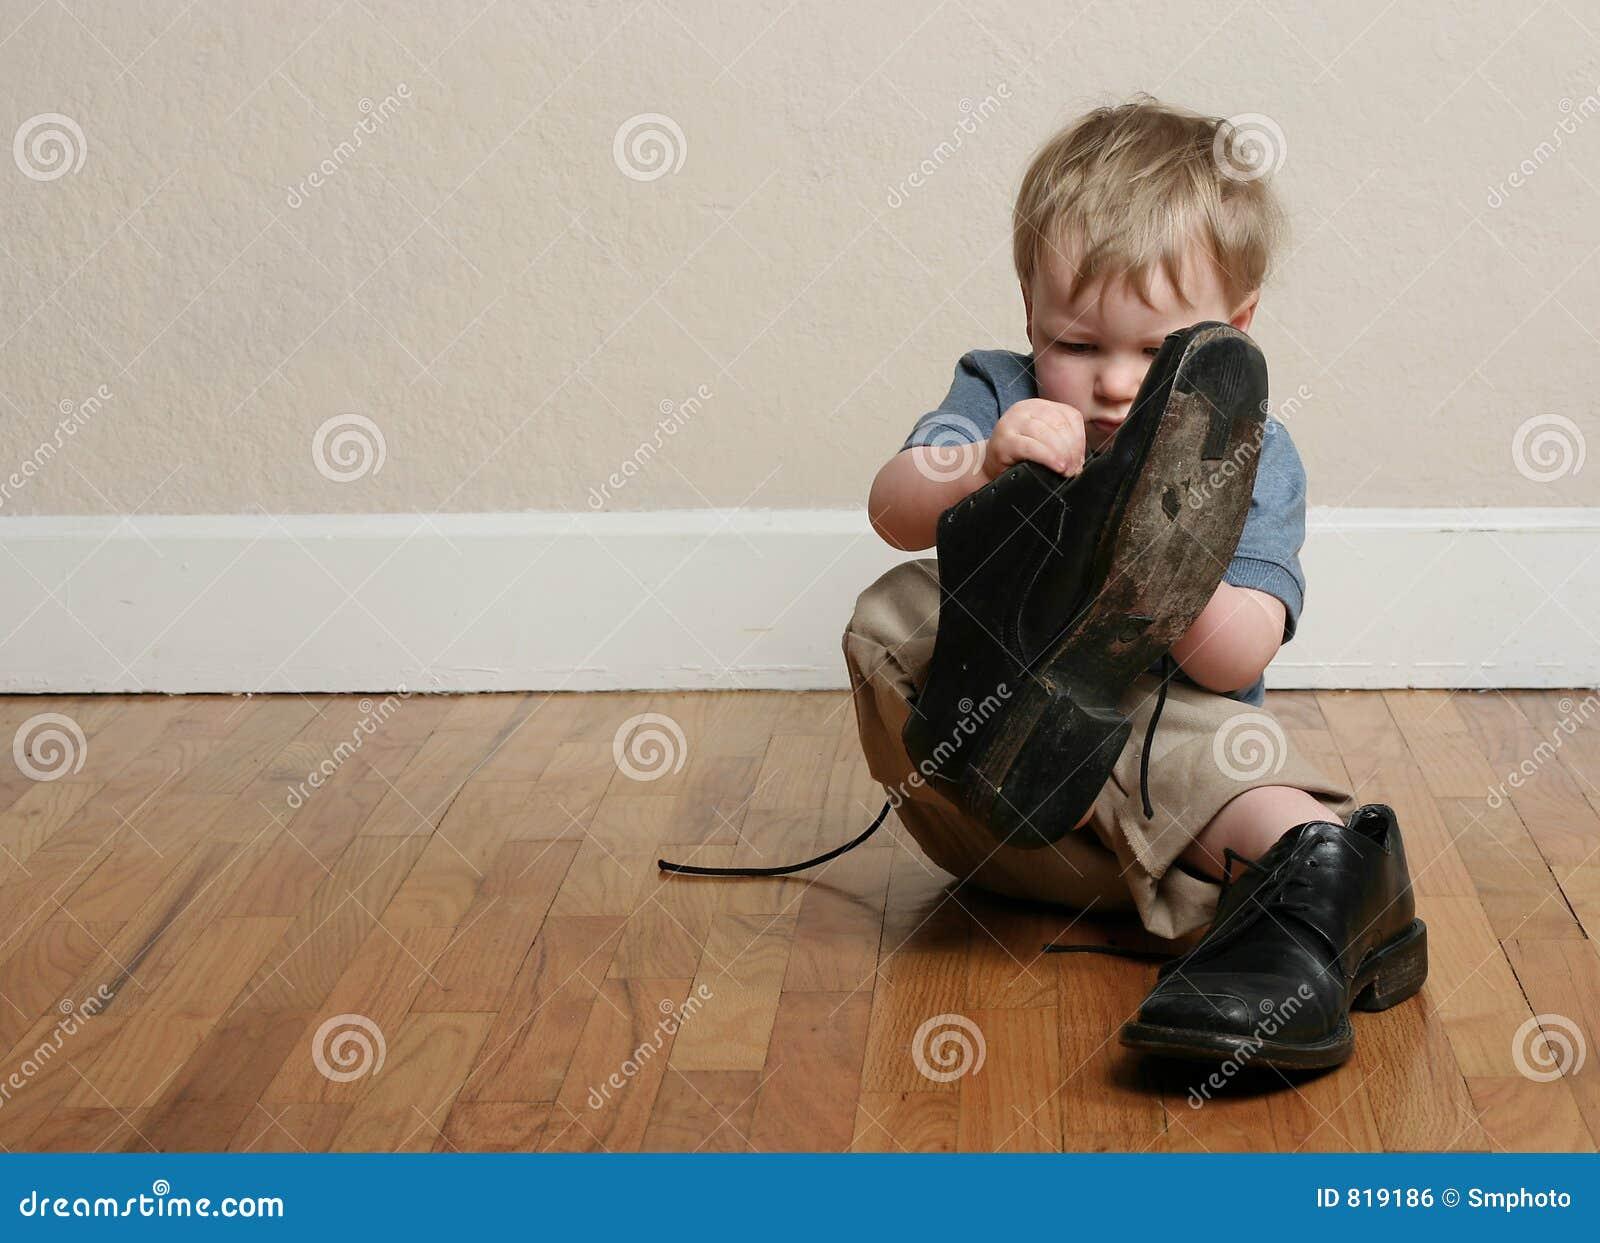 big shoes little feet stock photo image of toddler. Black Bedroom Furniture Sets. Home Design Ideas